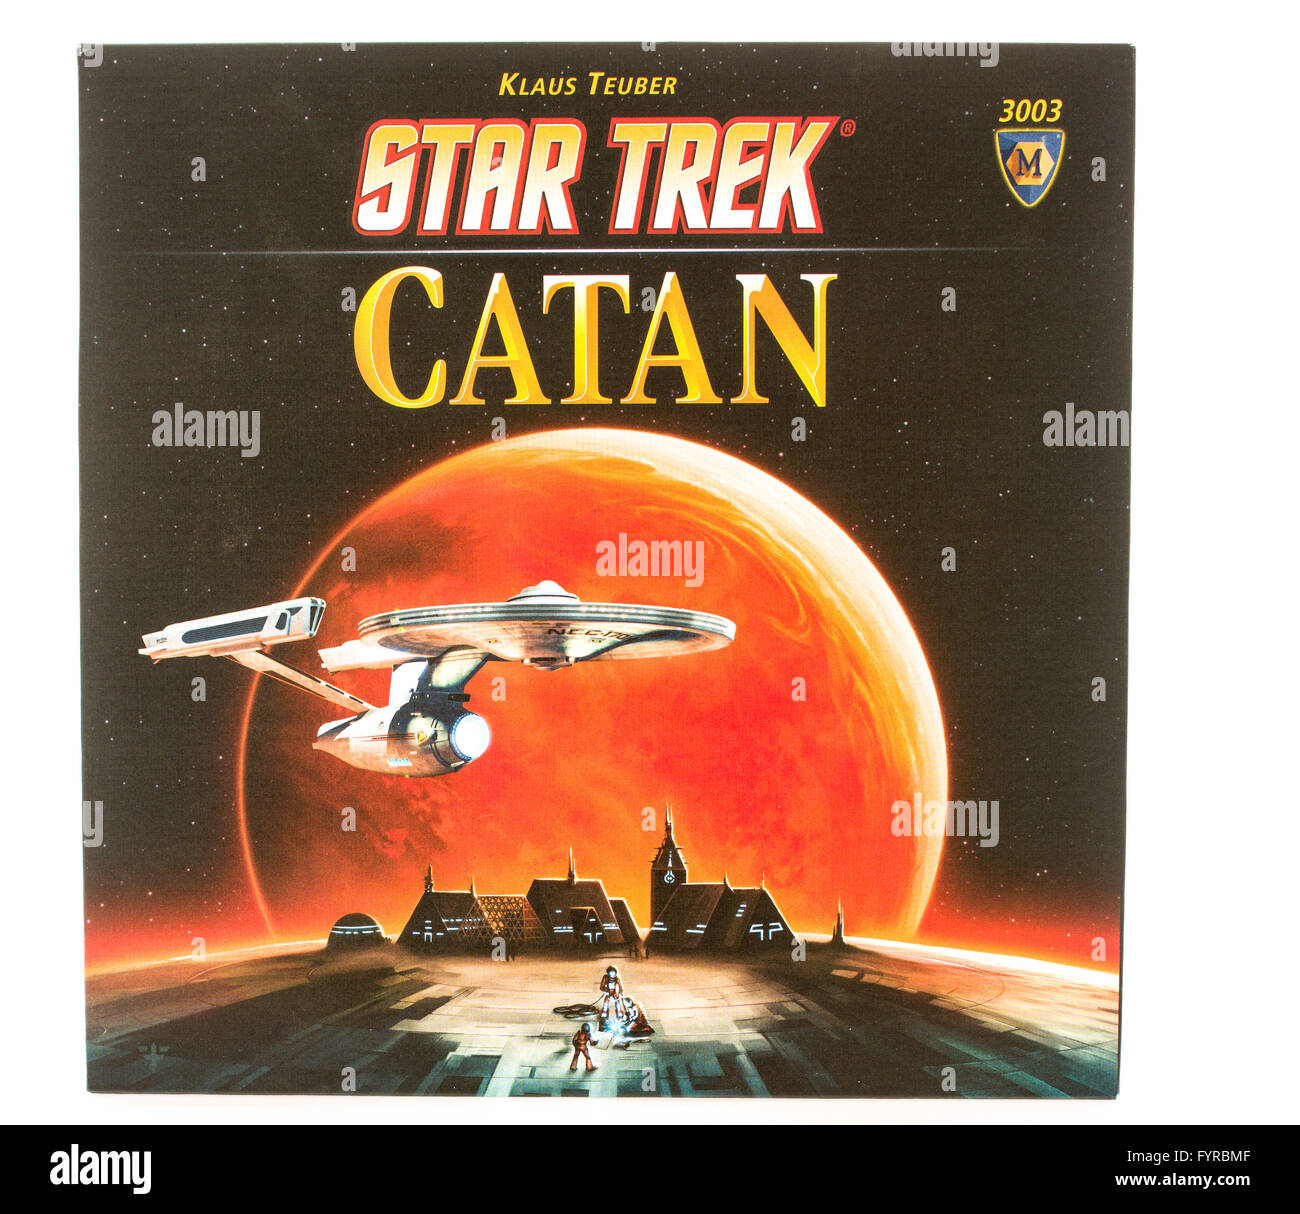 Winneconni, WI - 12 June 2015:  Box of the popular board game of Catan in Star Trek edition. - Stock Image